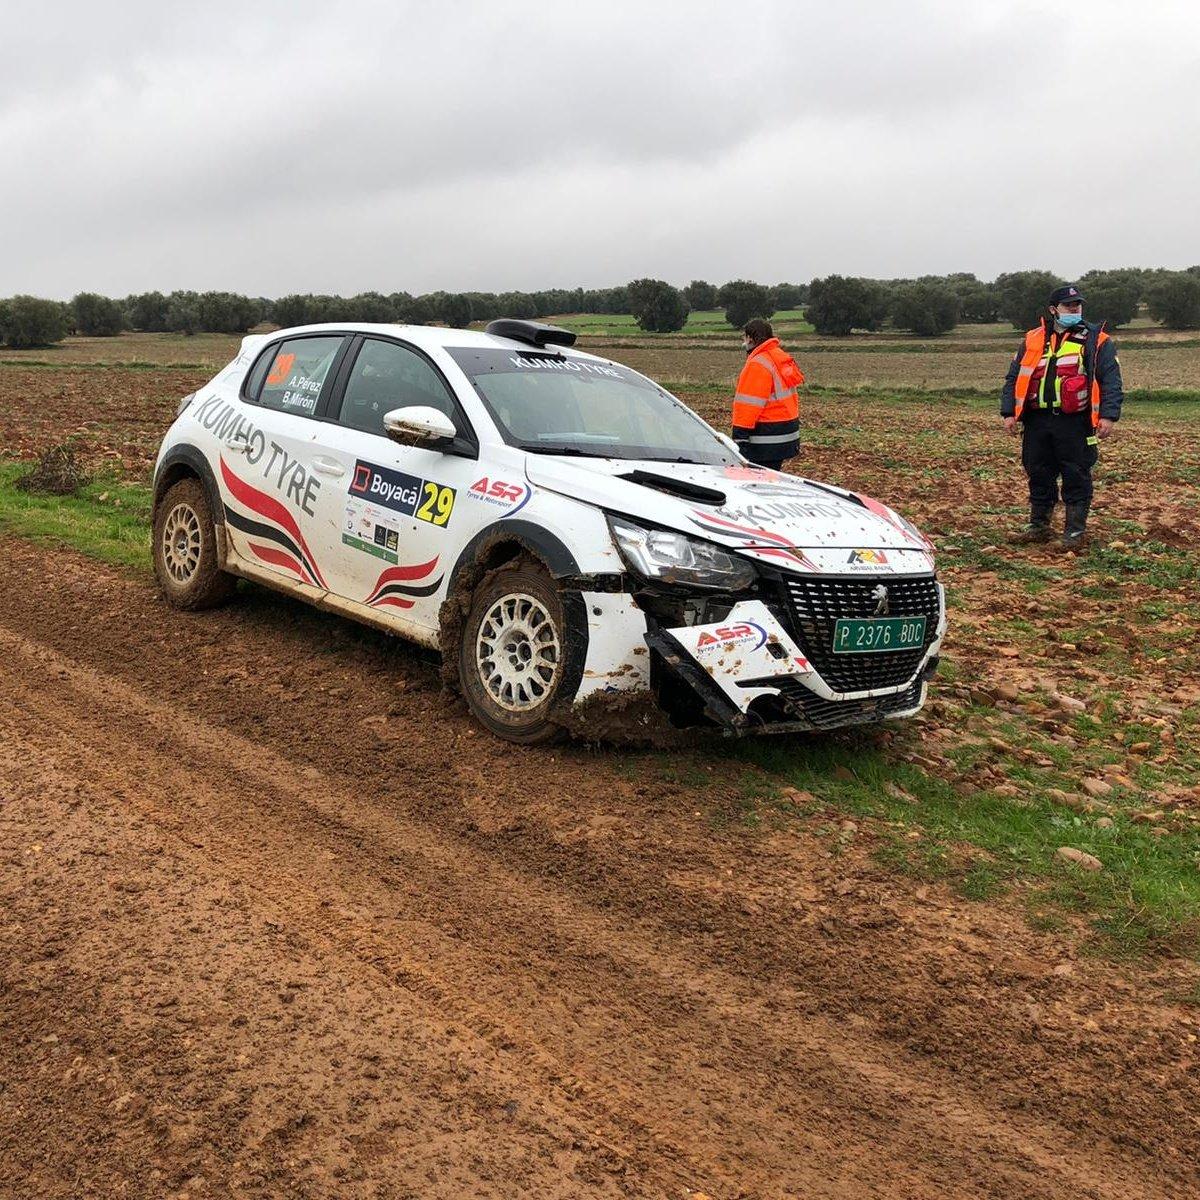 SCER + CERT: Rallye de Tierra de Madrid [13-14 Noviembre] - Página 4 EmyoebVXMAICFpQ?format=jpg&name=medium